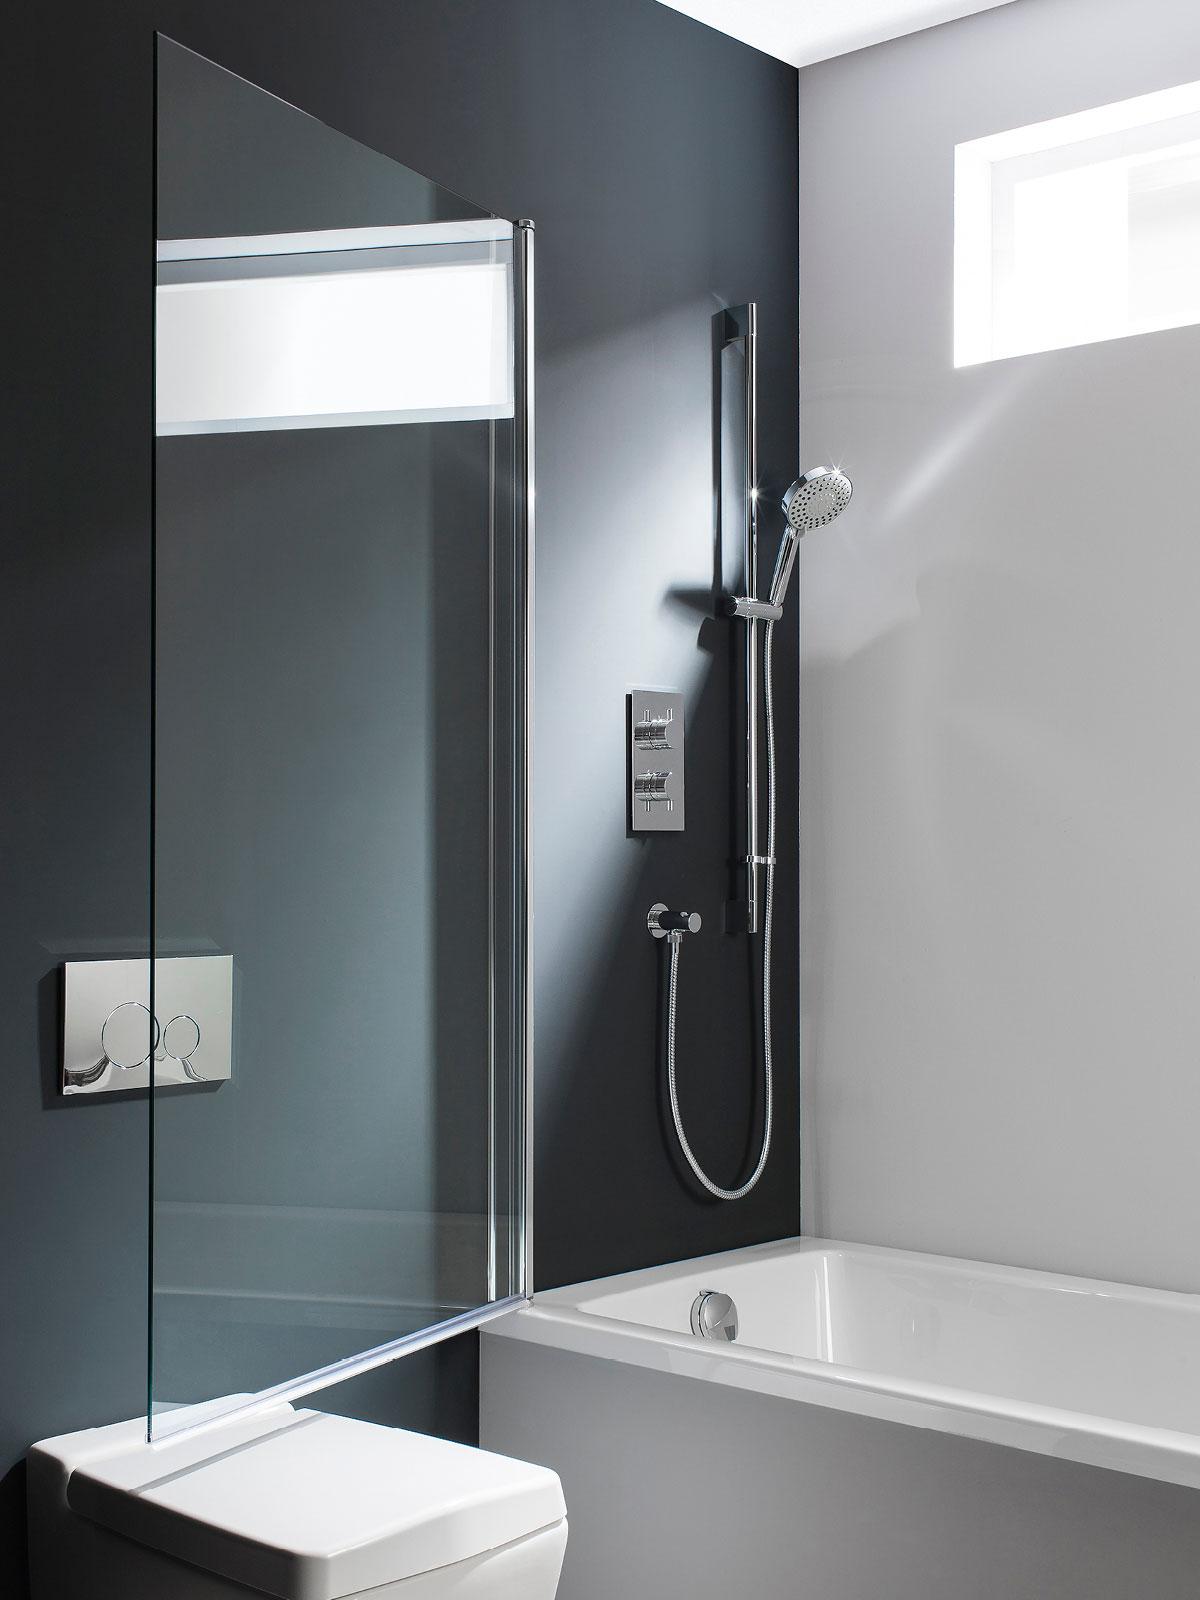 DBSSC0850 swivelling through 180 degrees frame-less bath screen simpsons design